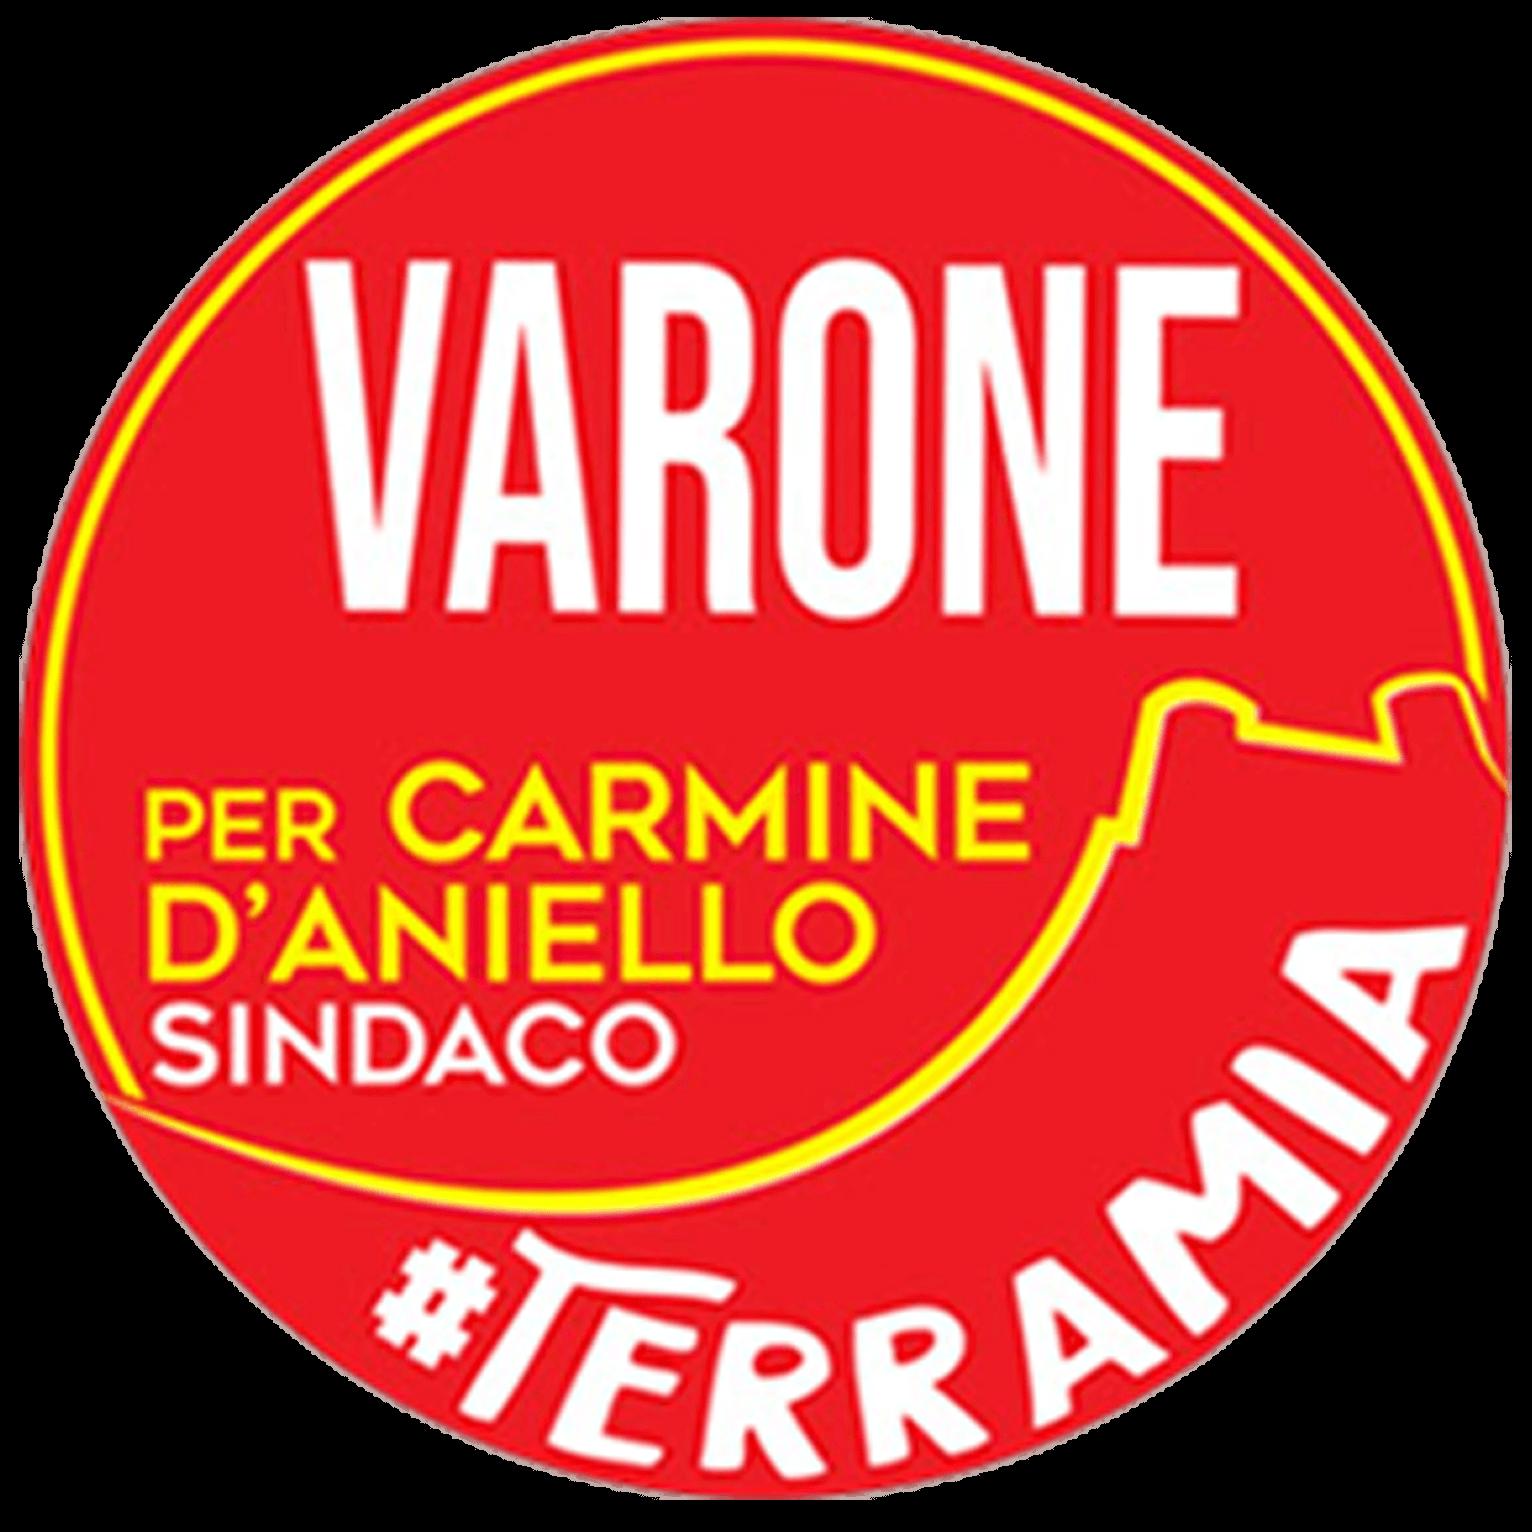 Lista Antonio Varone per carmine daniello sindaco sant antonio abate